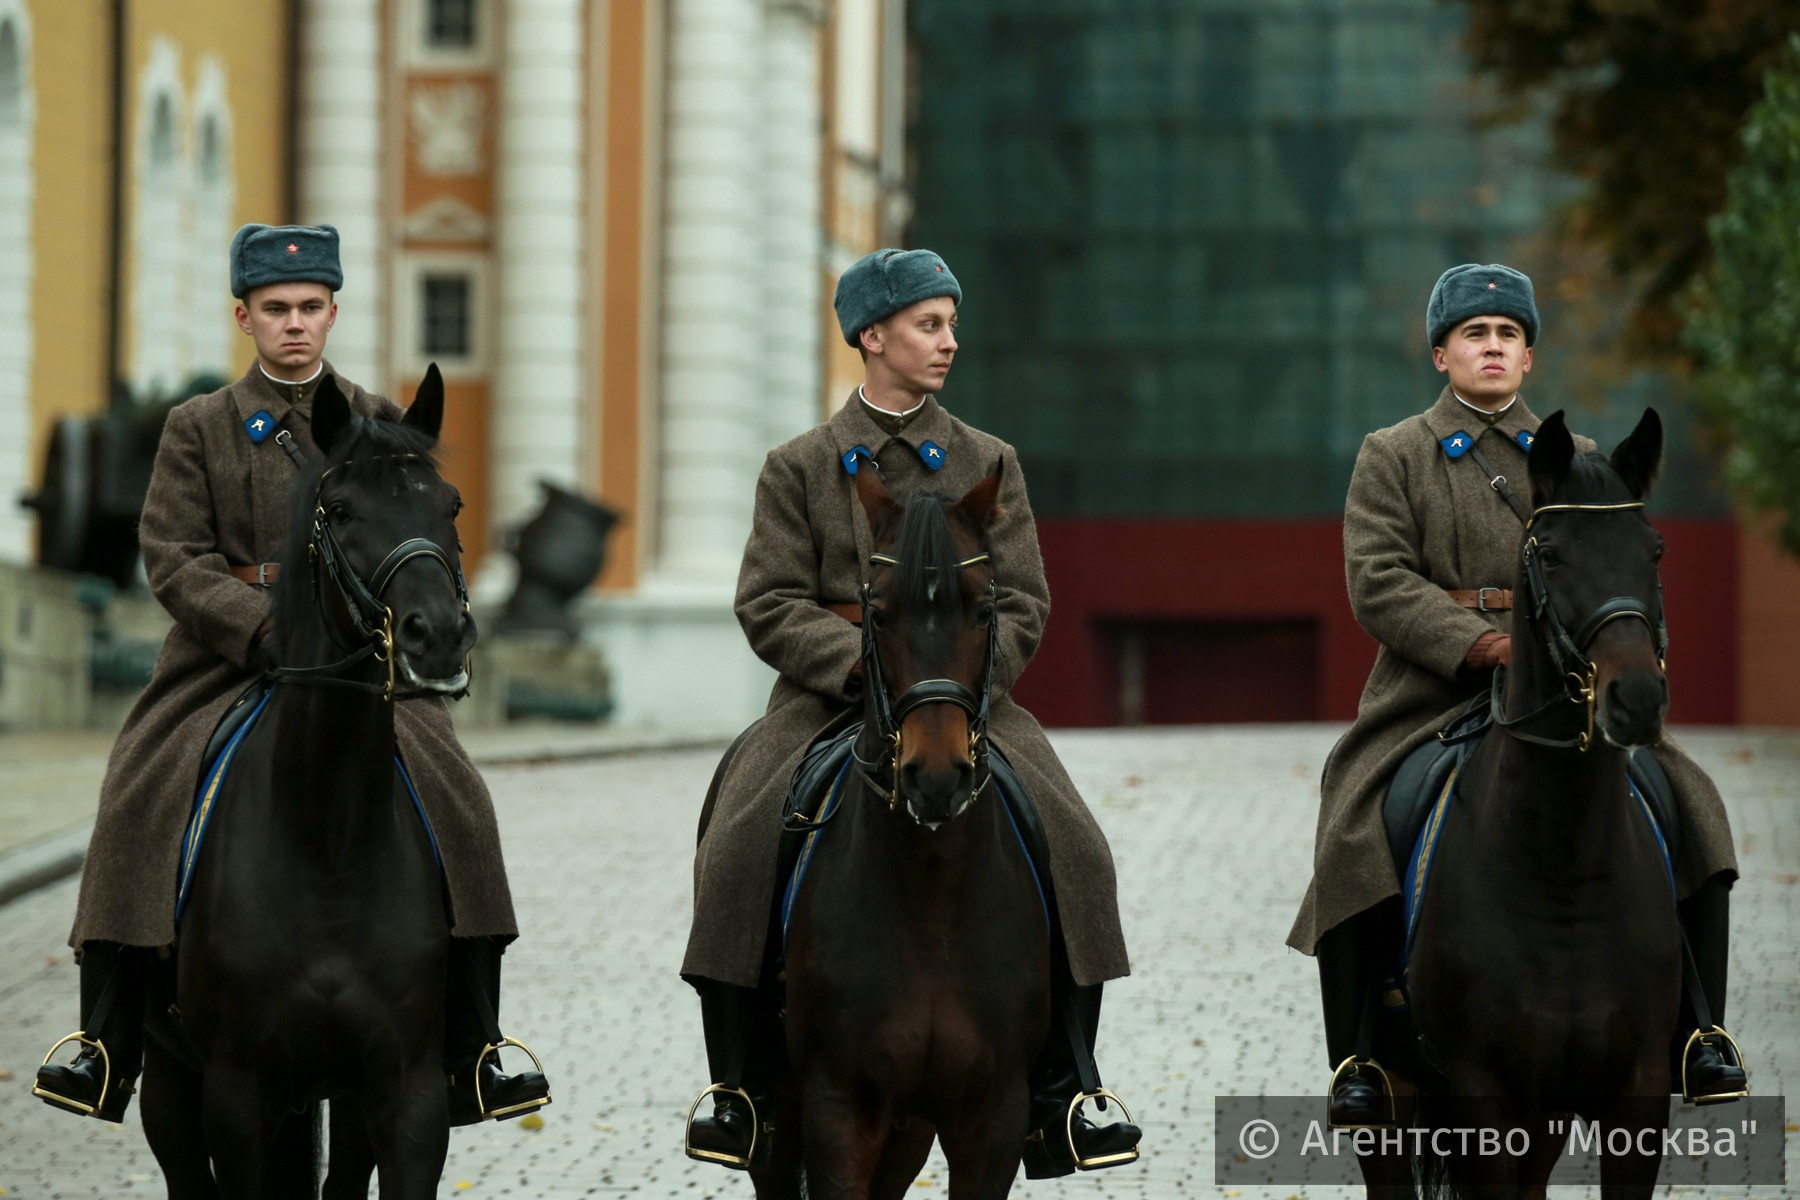 Photo of Прошел последний в 2016 году развод караула в Кремле  Прошел последний в 2016 году развод караула в Кремле 238638